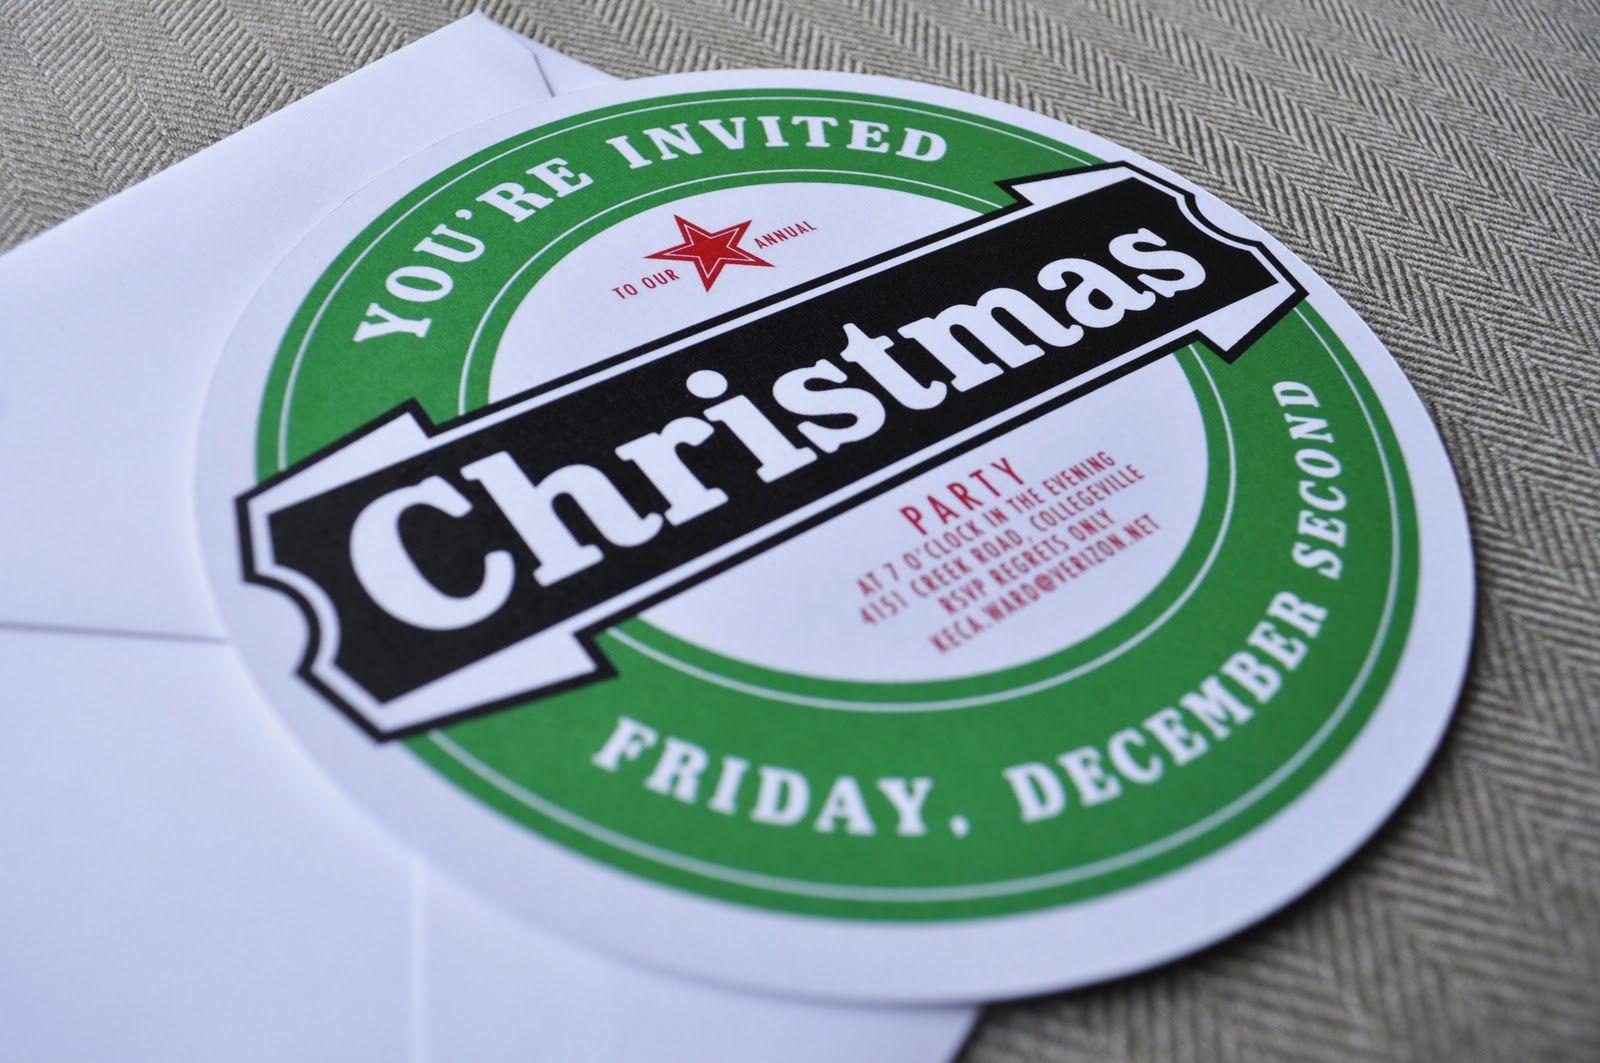 Custom Christmas Party Invitations | CKV Party | Pinterest ...